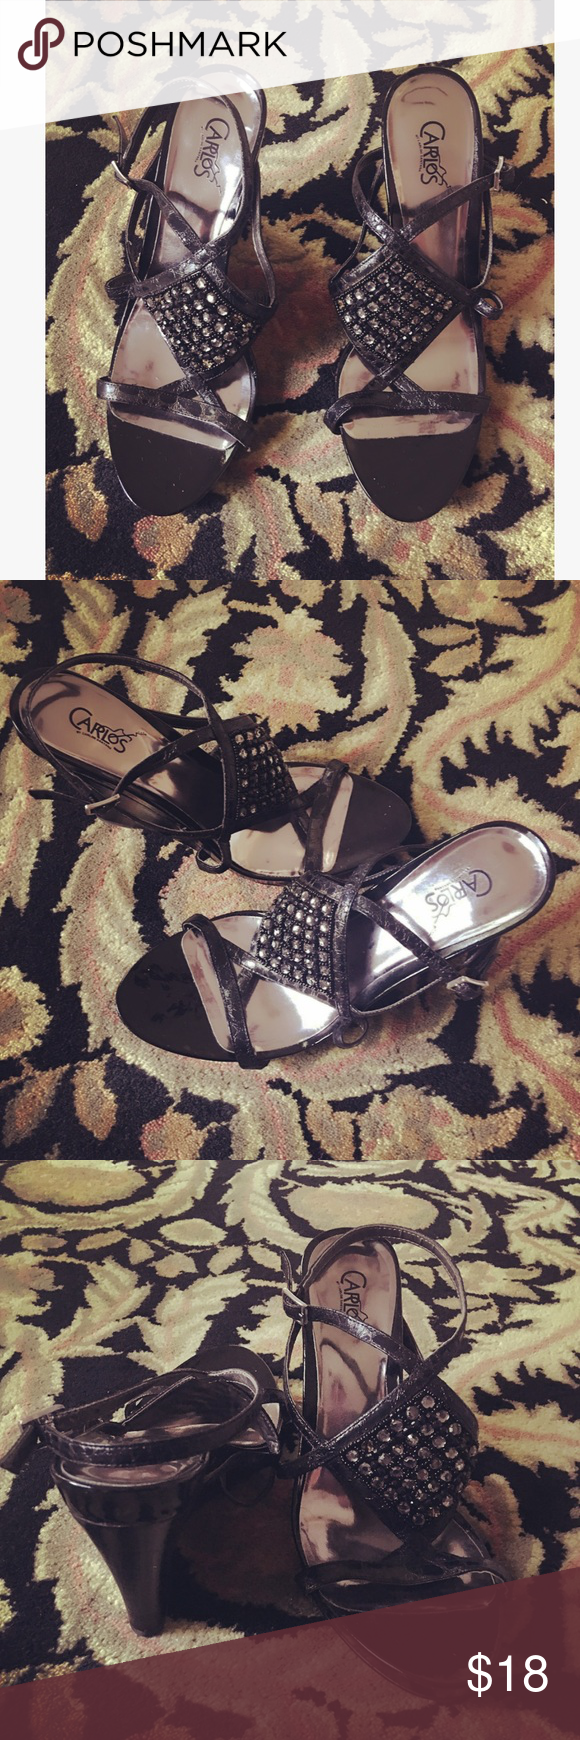 Carlos Santana Shoes  Brand: Carlos Santana. Condition: Used/ Good. Missing a few rhinestones. Carlos Santana Shoes Wedges